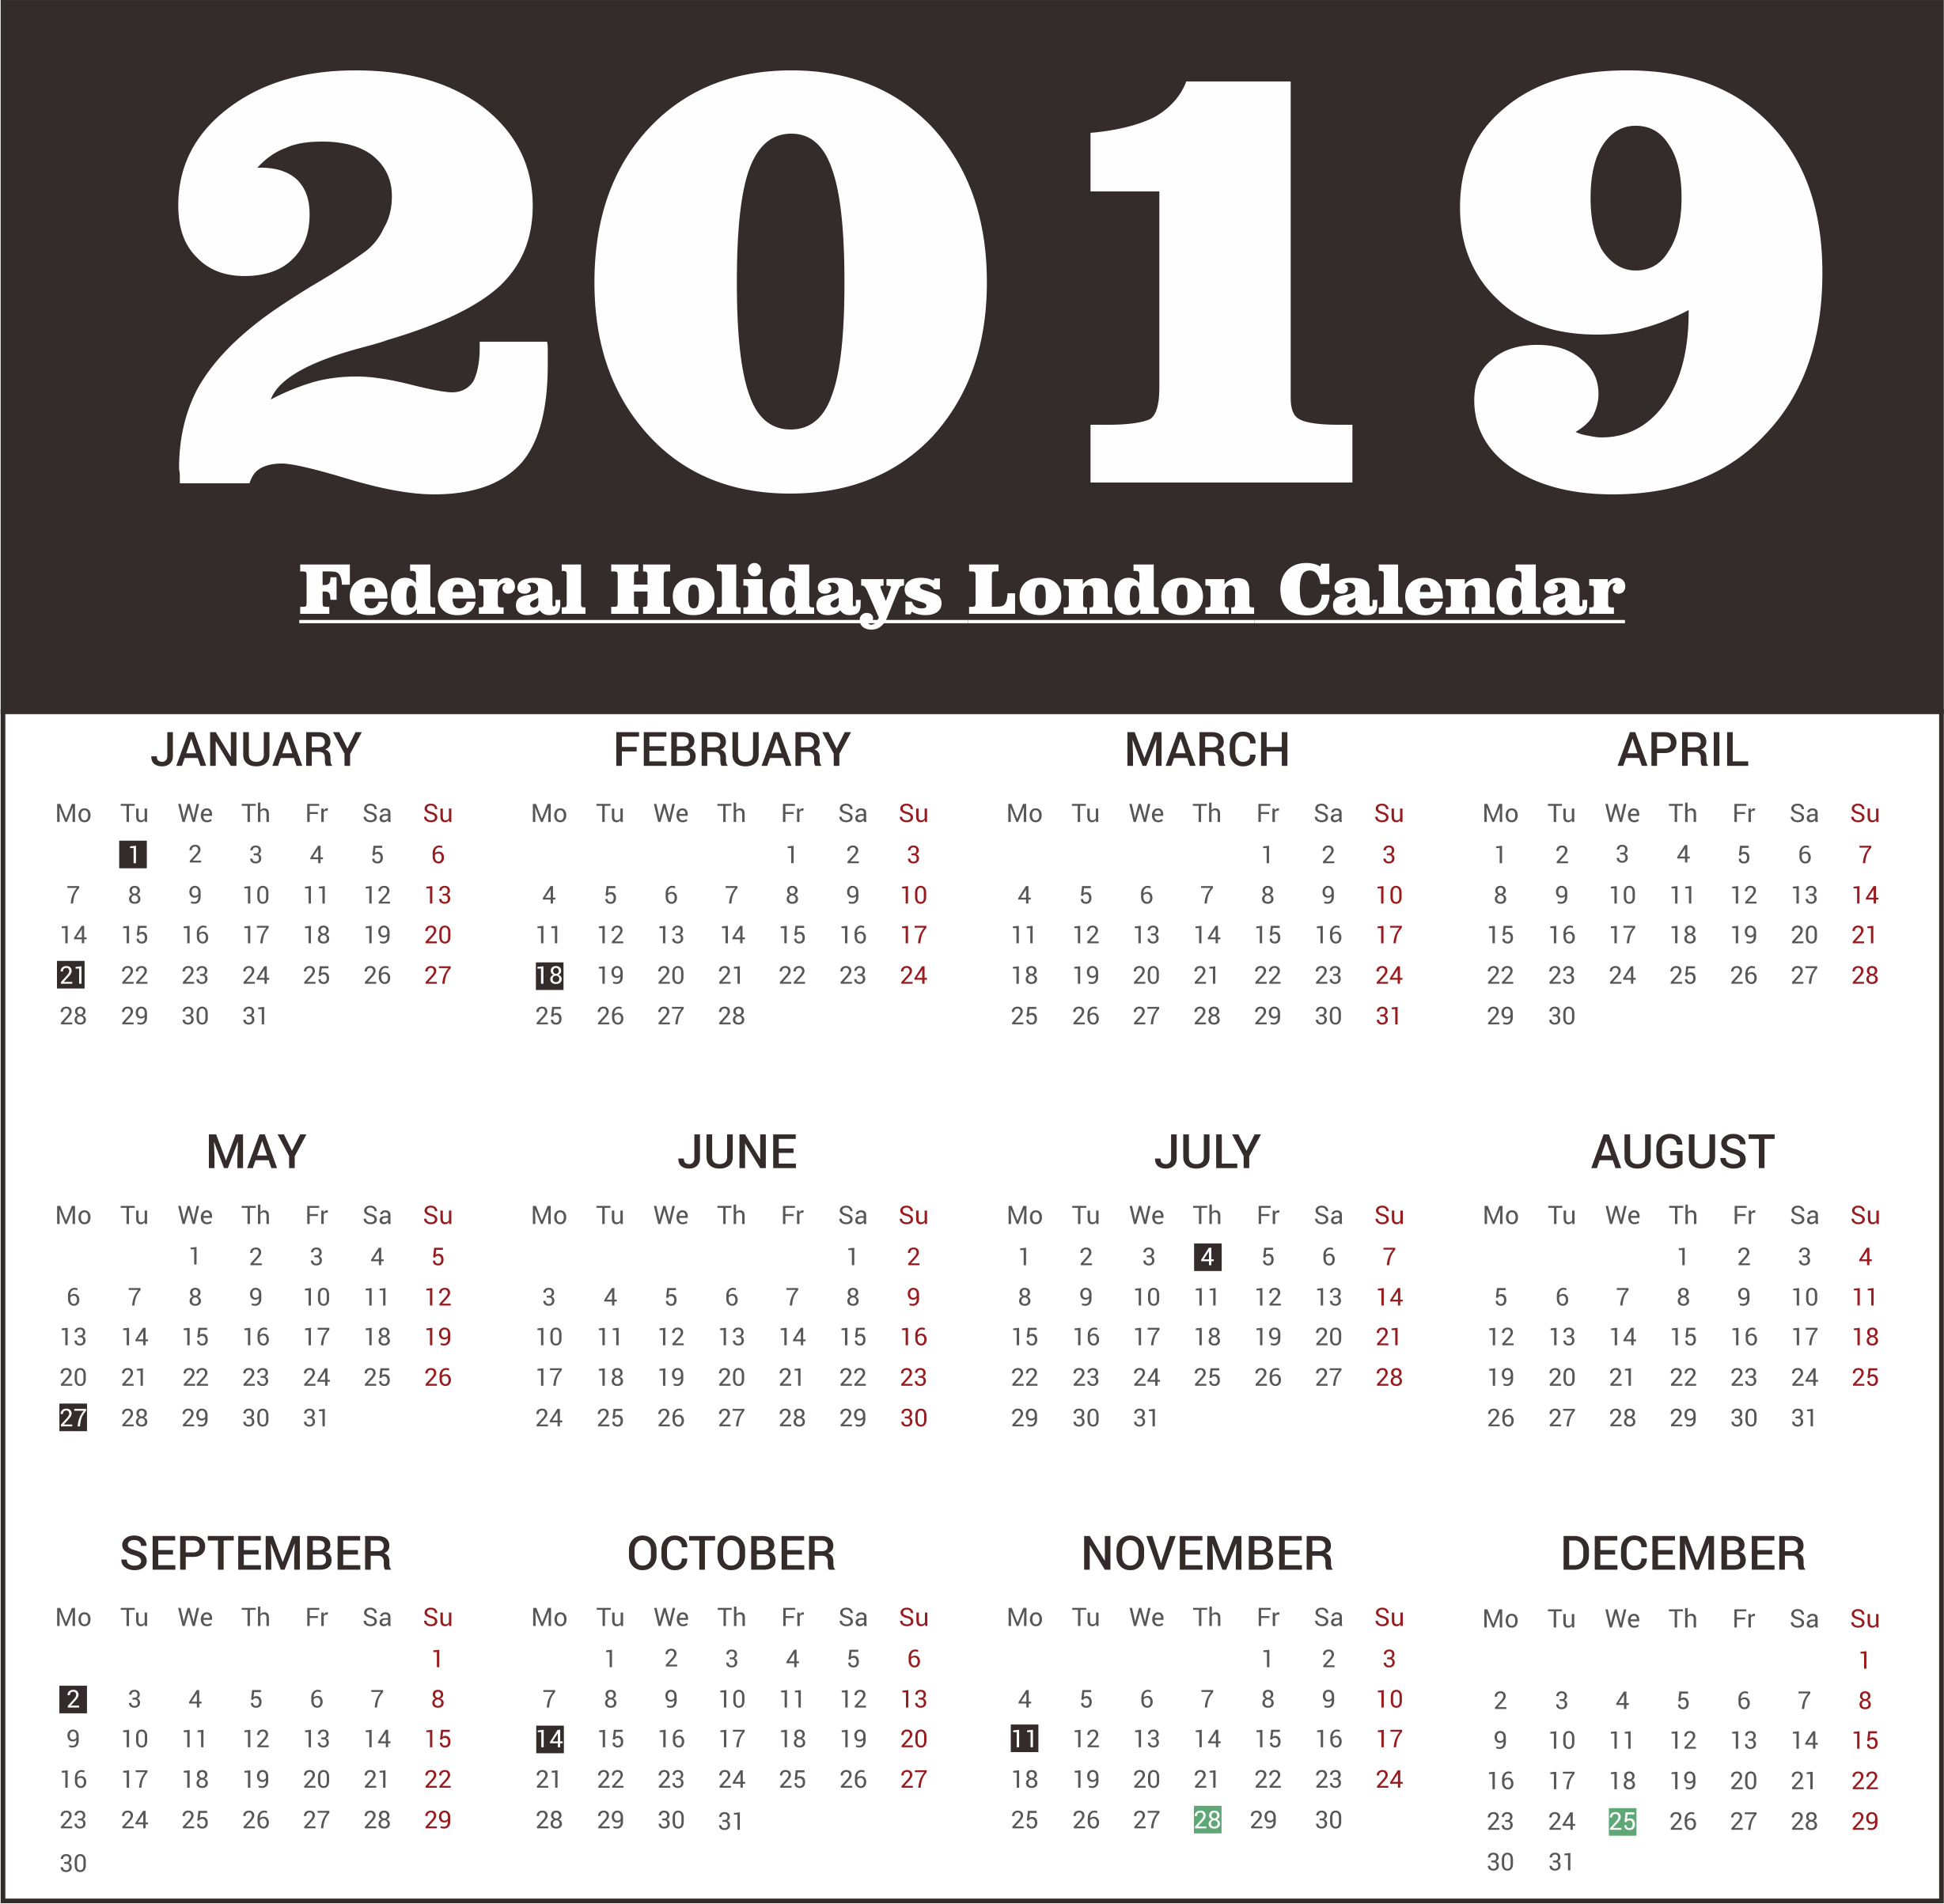 Federal Holidays 2019 London